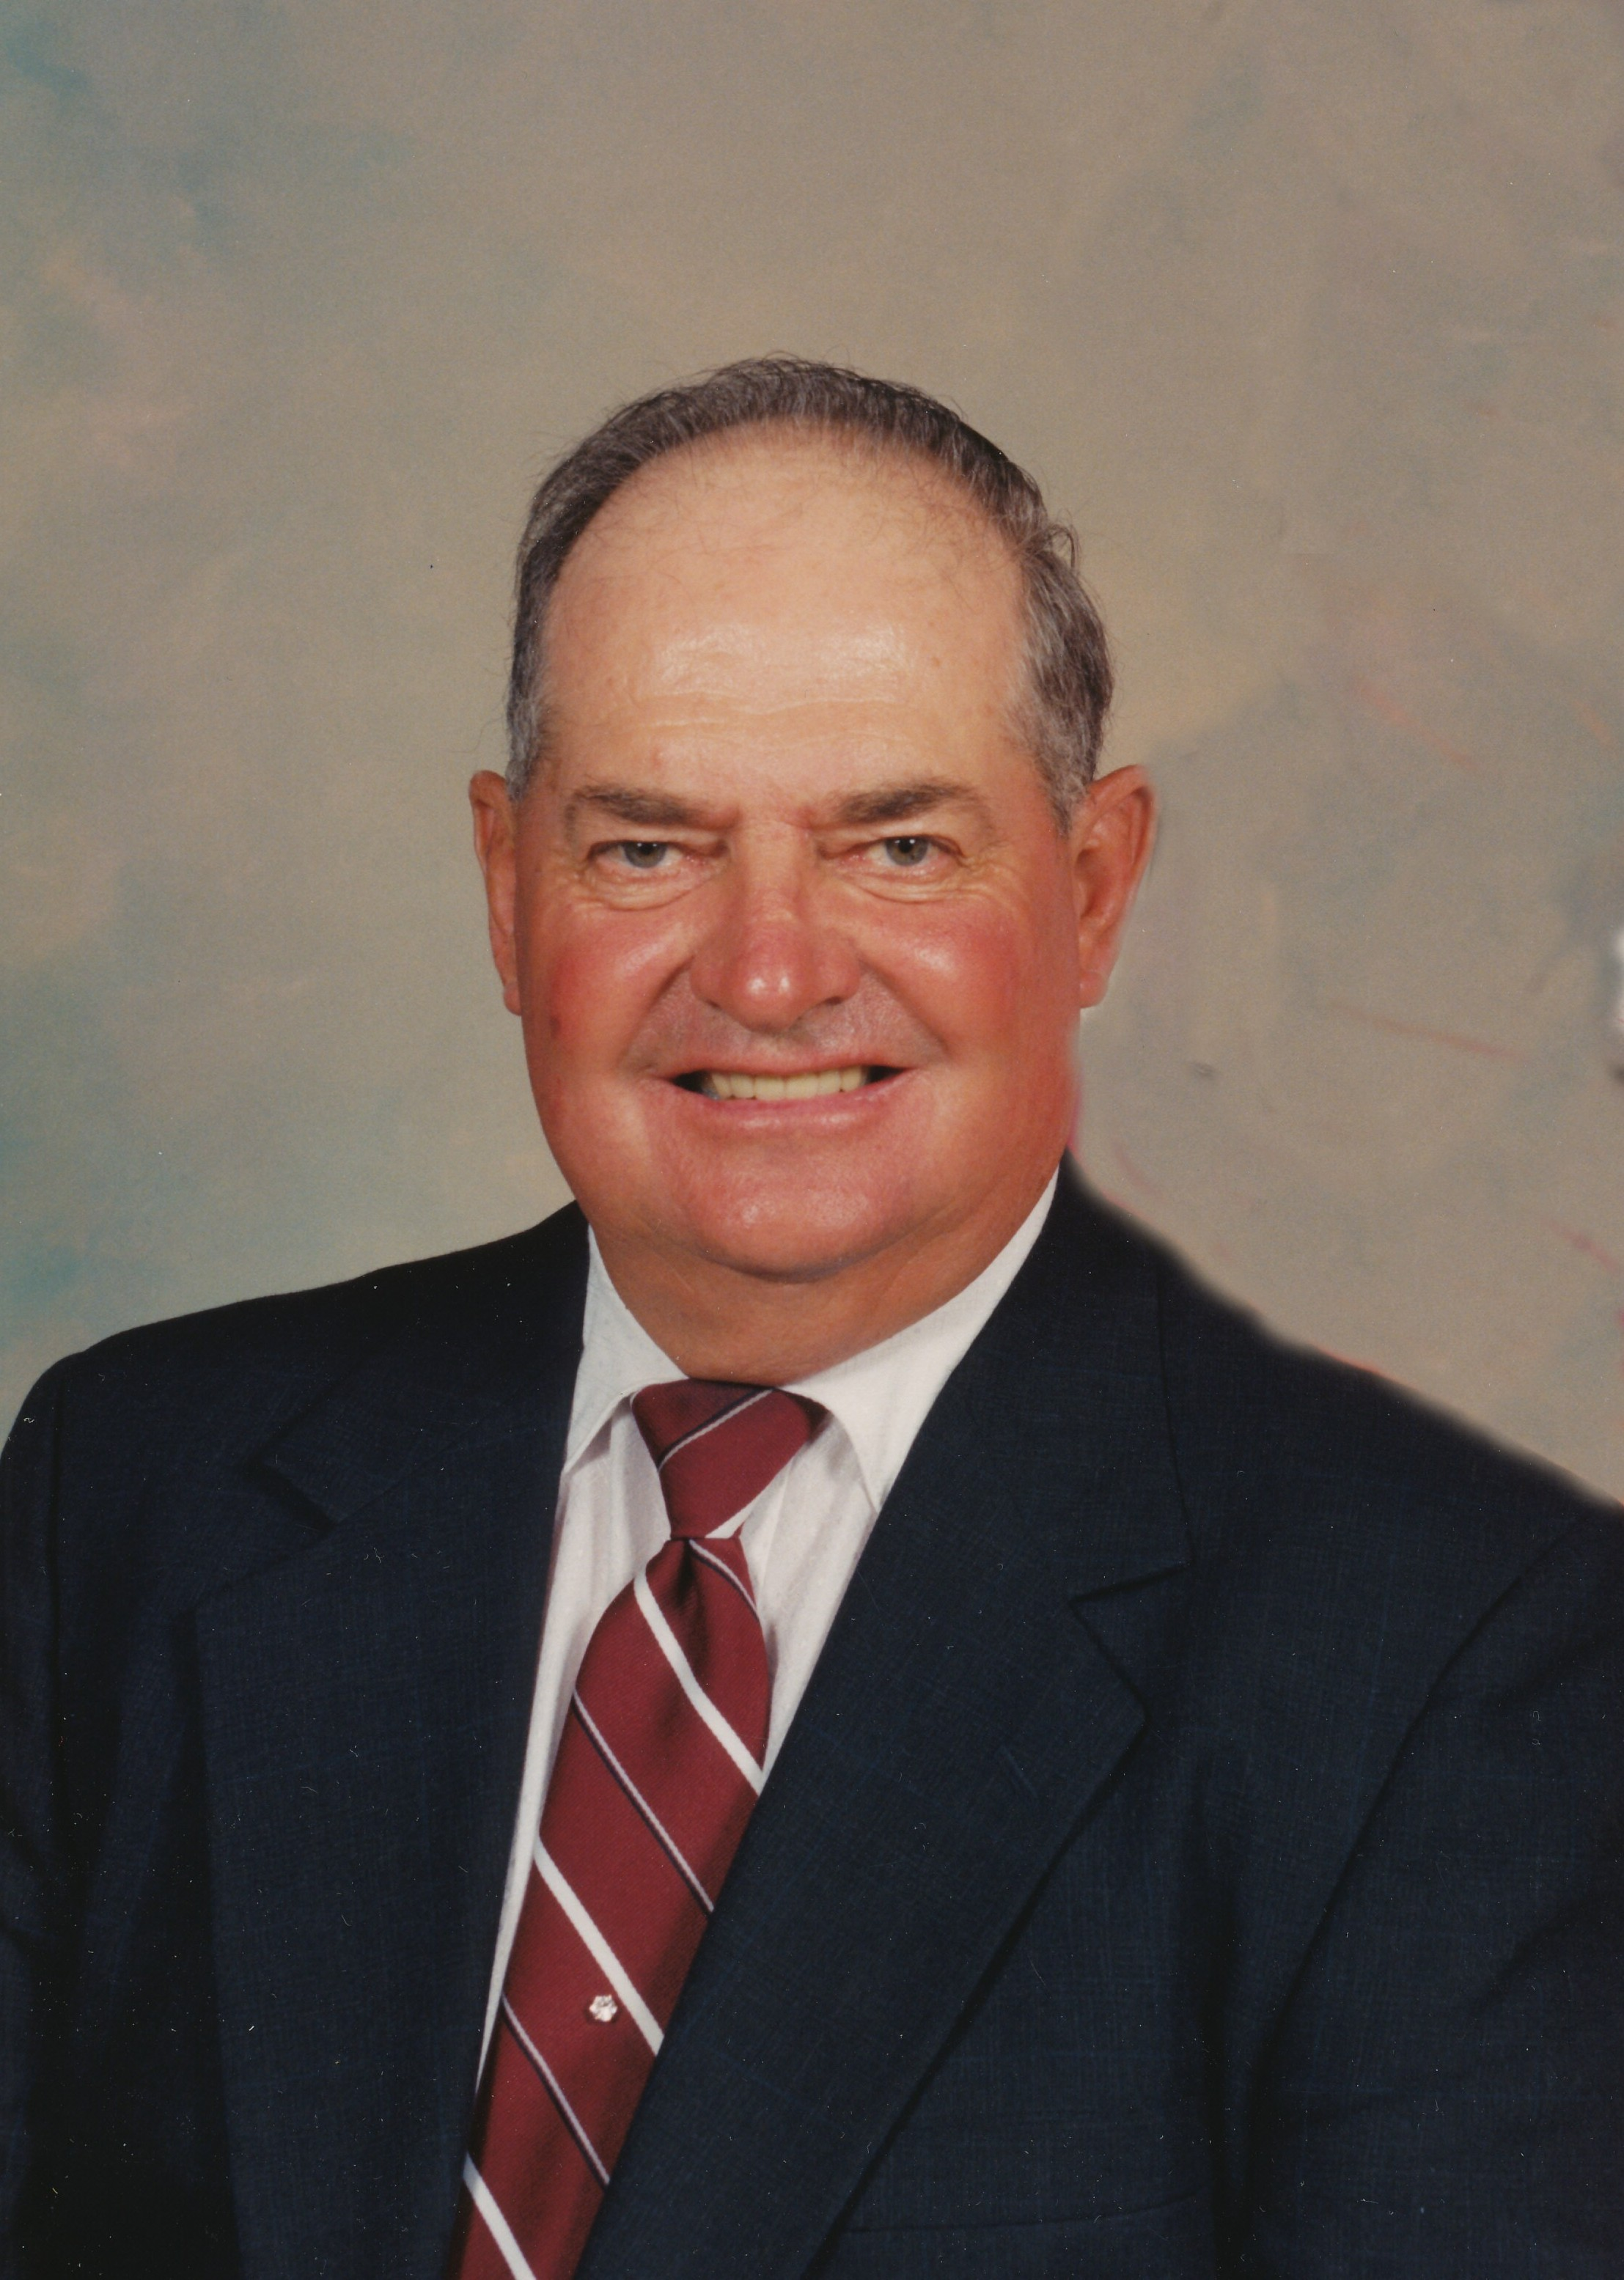 Orven Lueshen, age 86, of West Point, Nebraska